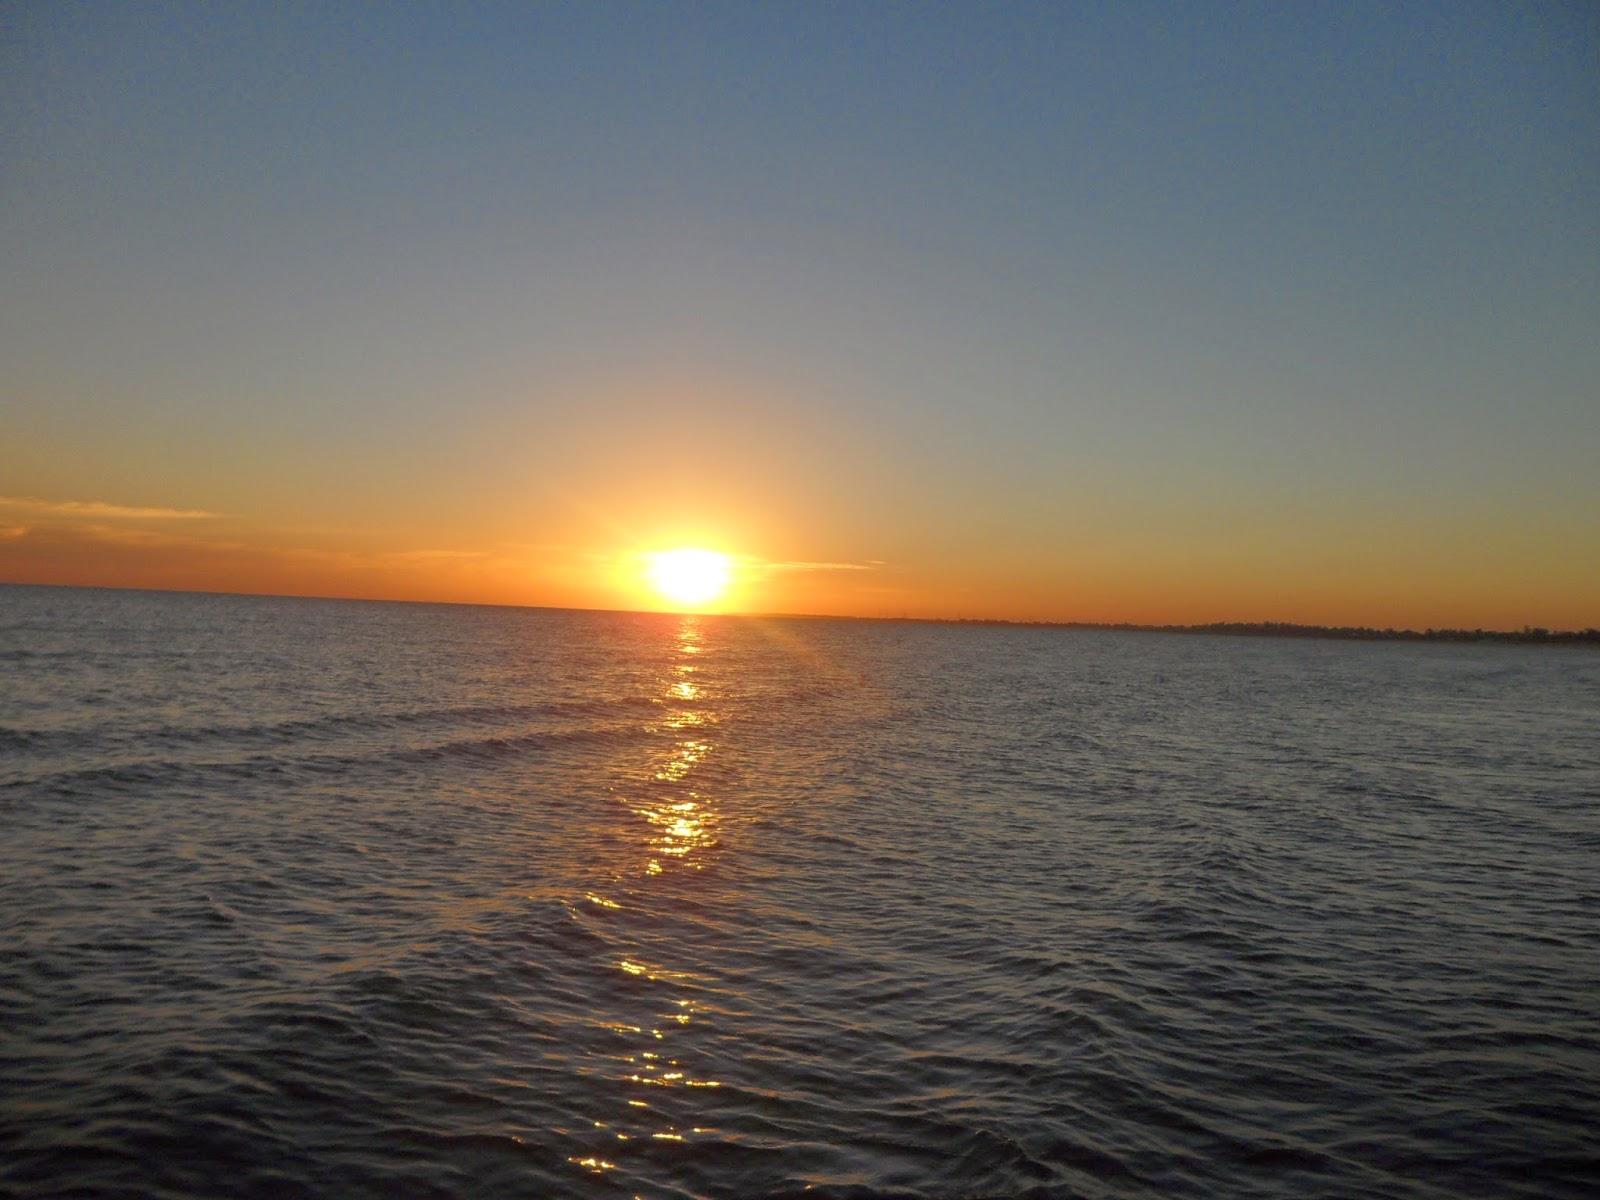 playa sol mar atardecer